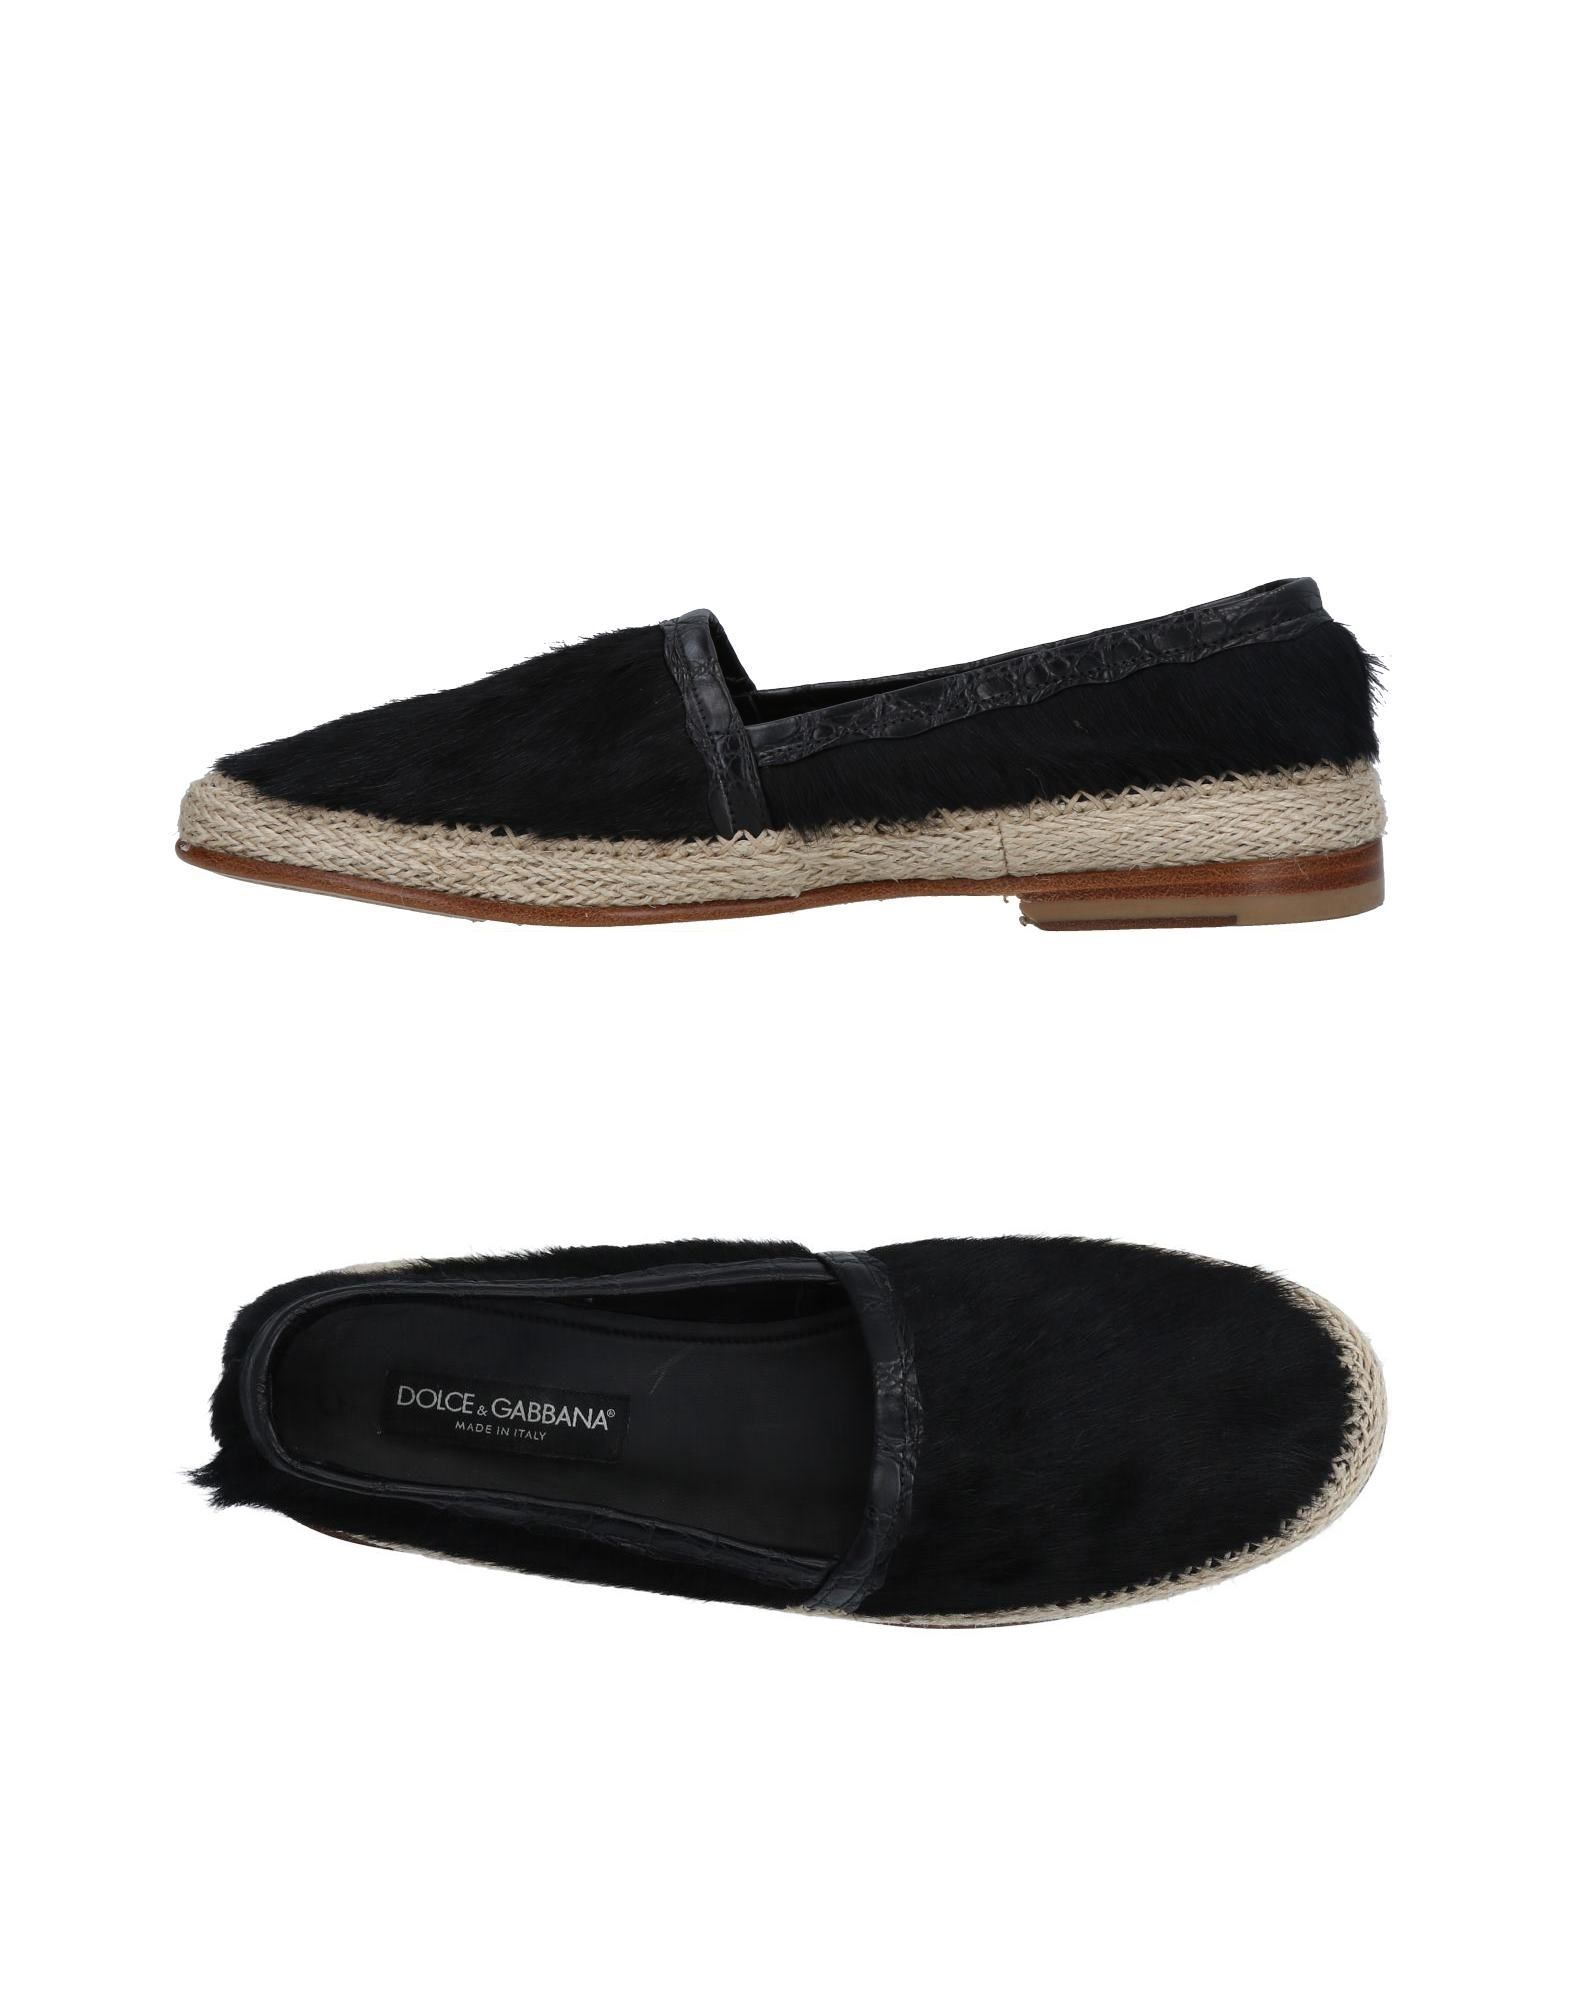 Dolce & Gabbana  Mokassins Herren  Gabbana 11493007UH  b67d90